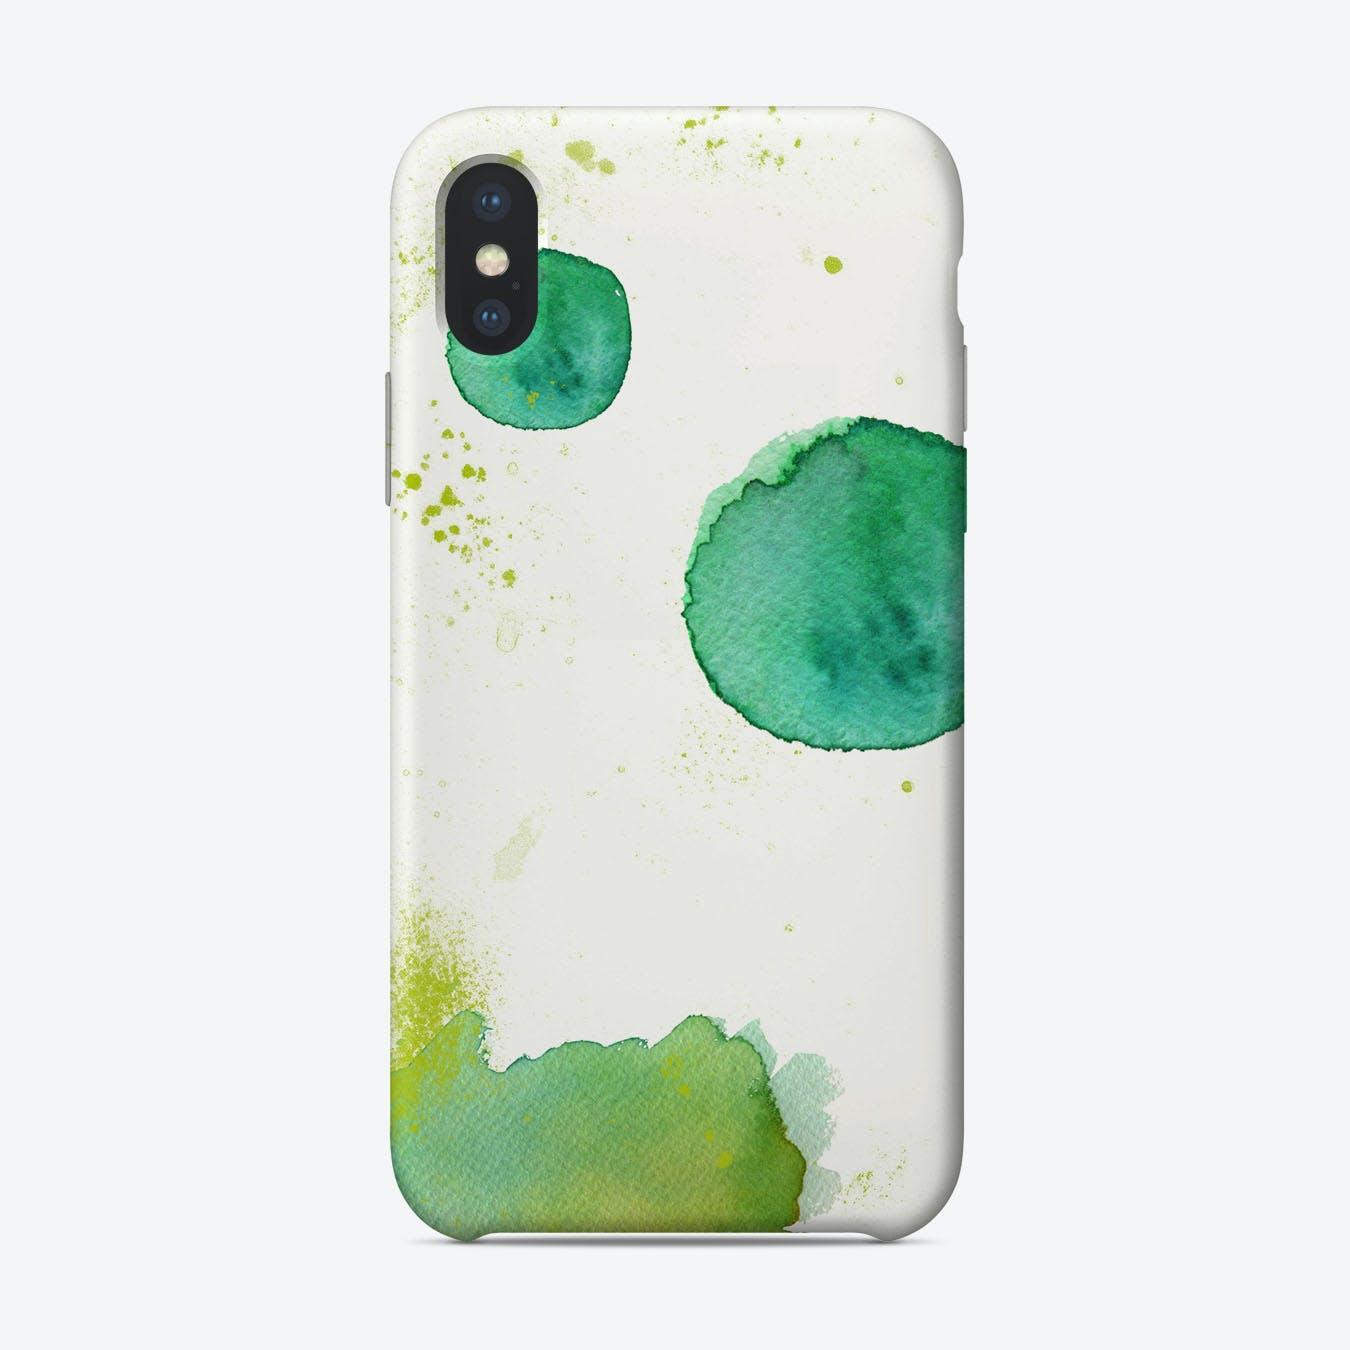 Kleckse iPhone Case